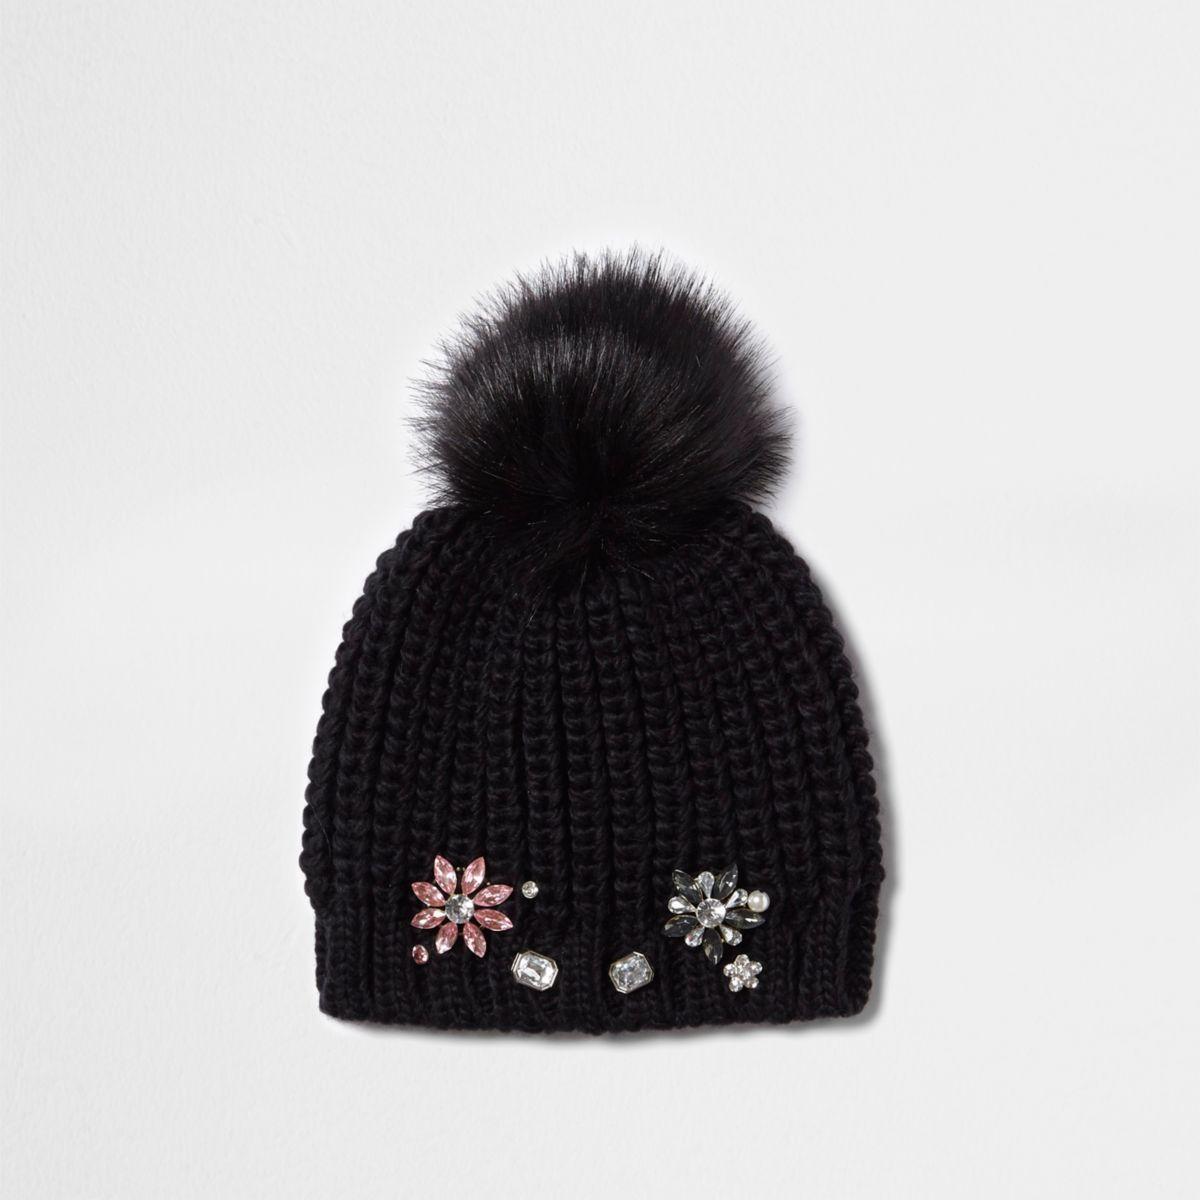 Girls black embellished bobble beanie hat